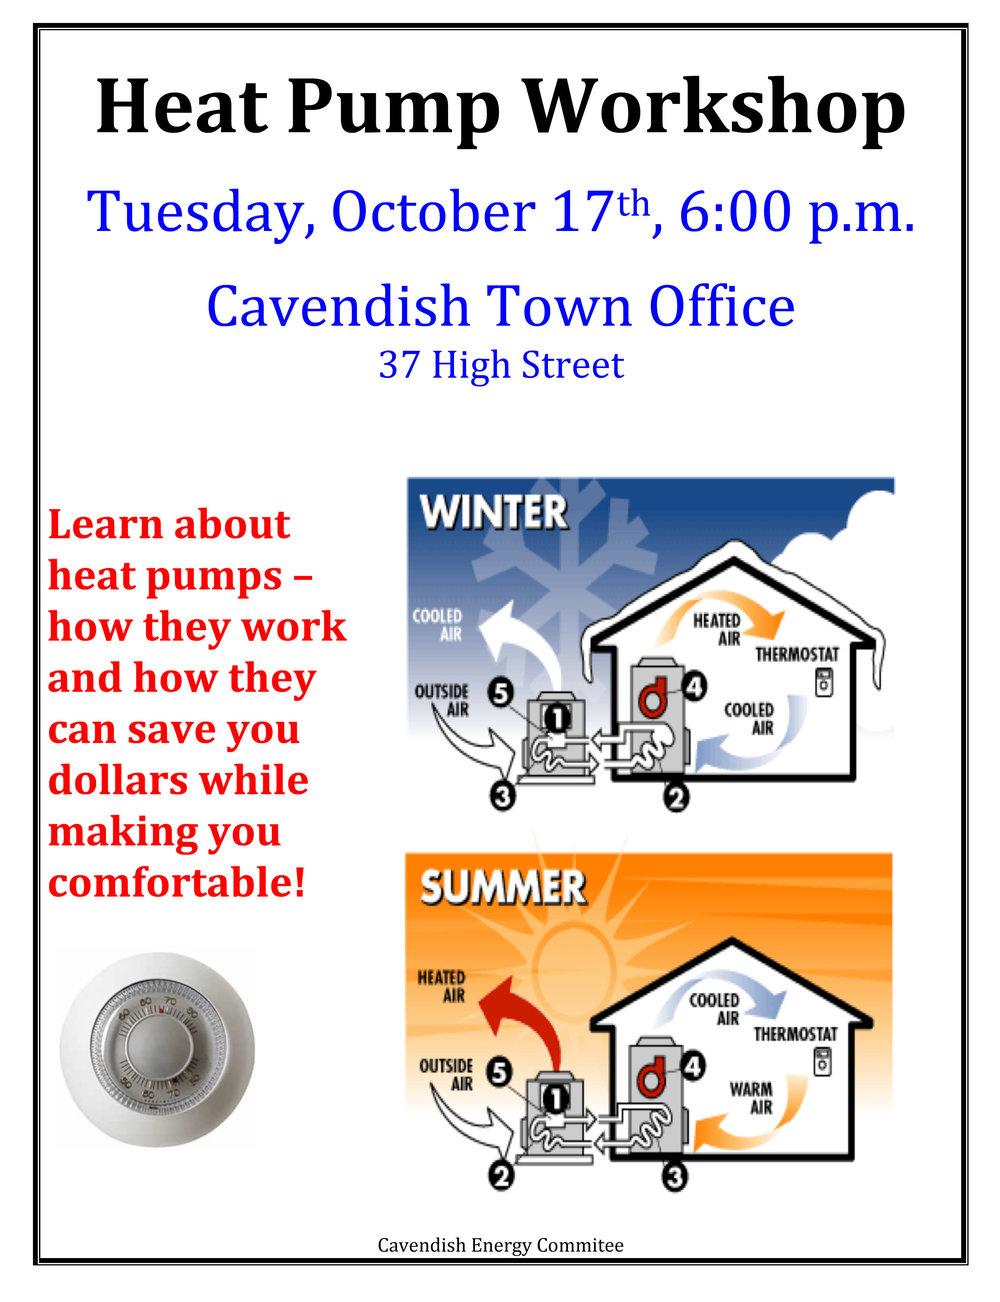 Heat Pump Workshop Poster-2.jpg